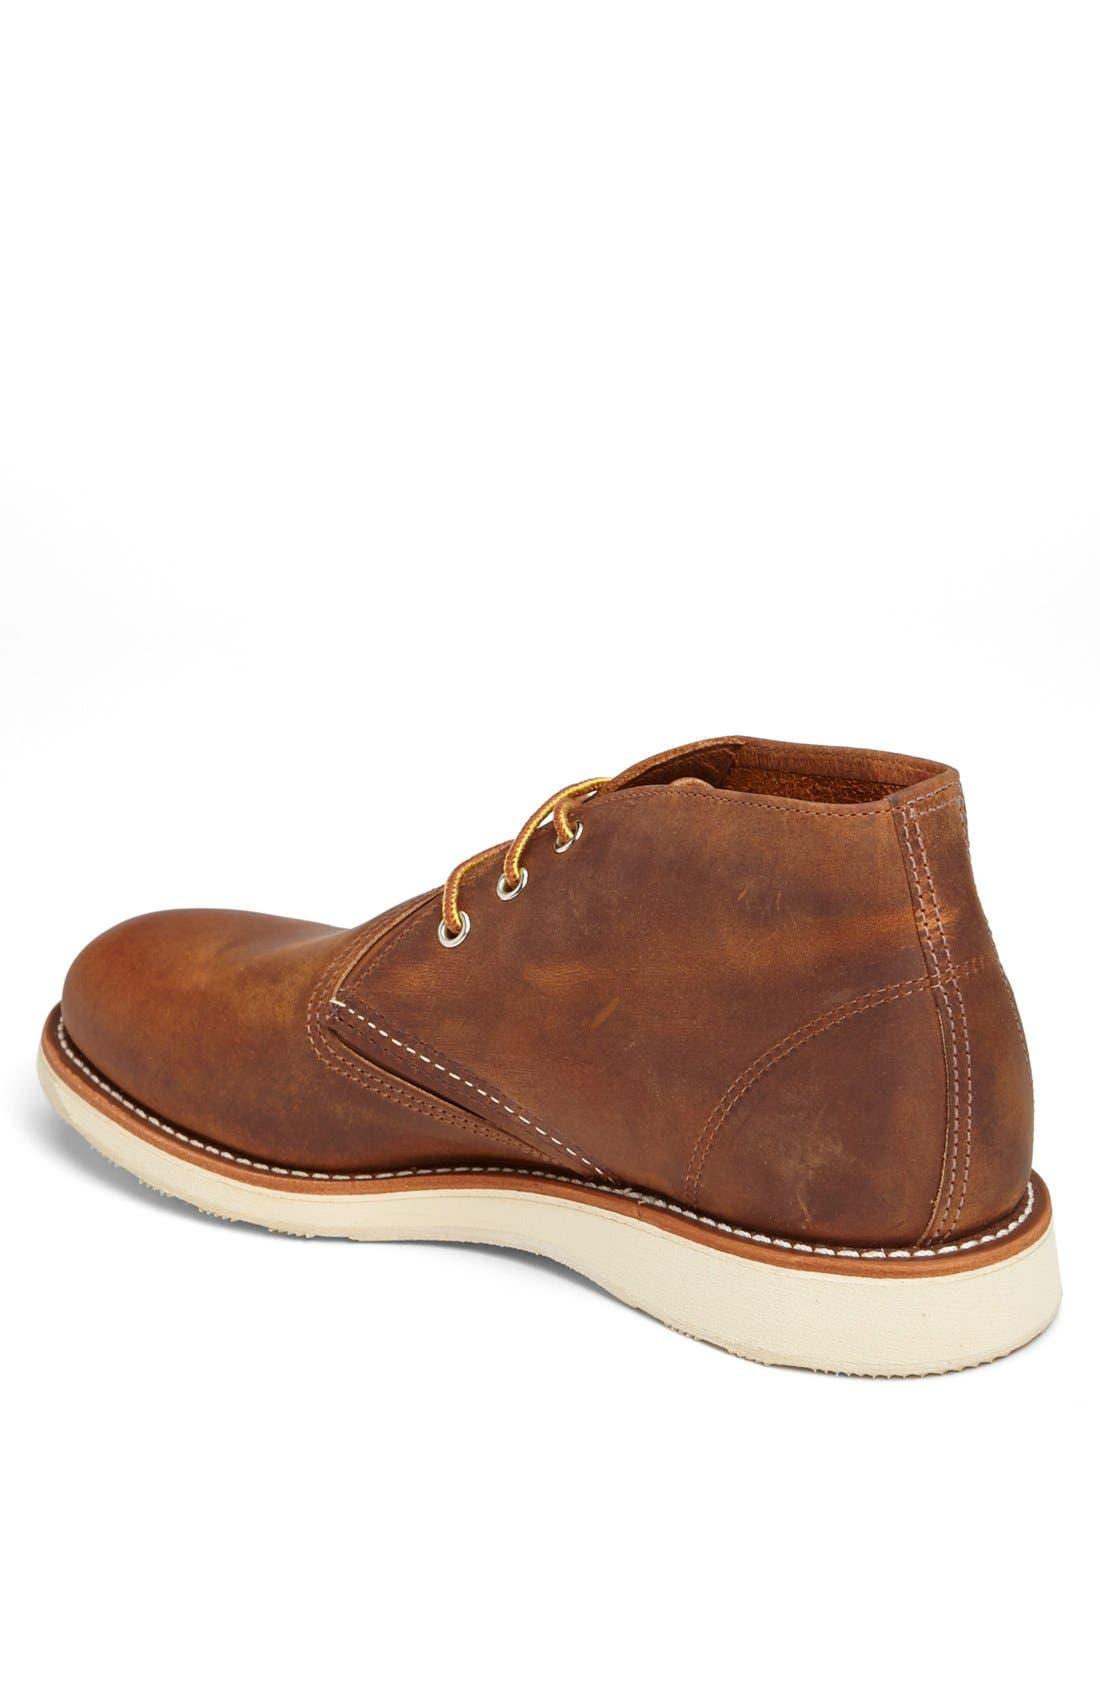 'Classic' Chukka Boot,                             Alternate thumbnail 2, color,                             212